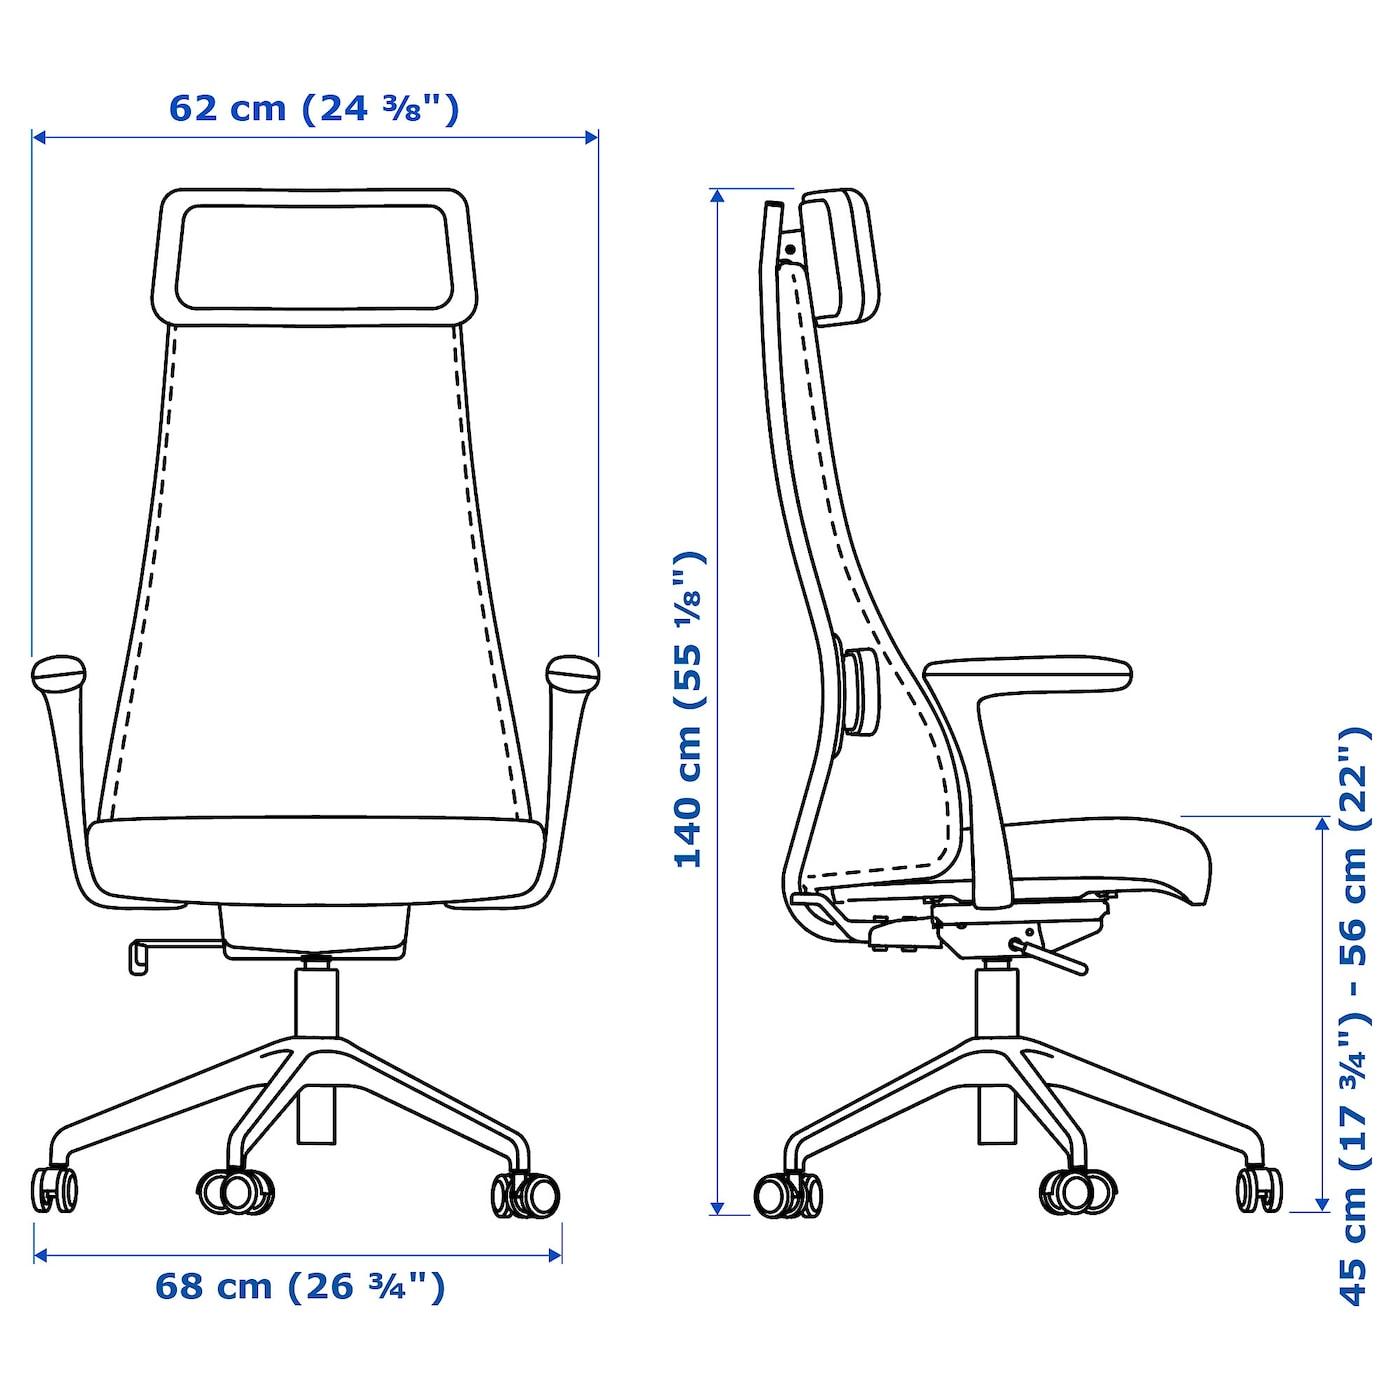 Järvfjället Bureau Chaise Noir Av AccoudoirsGlose De PuTlOZwXik